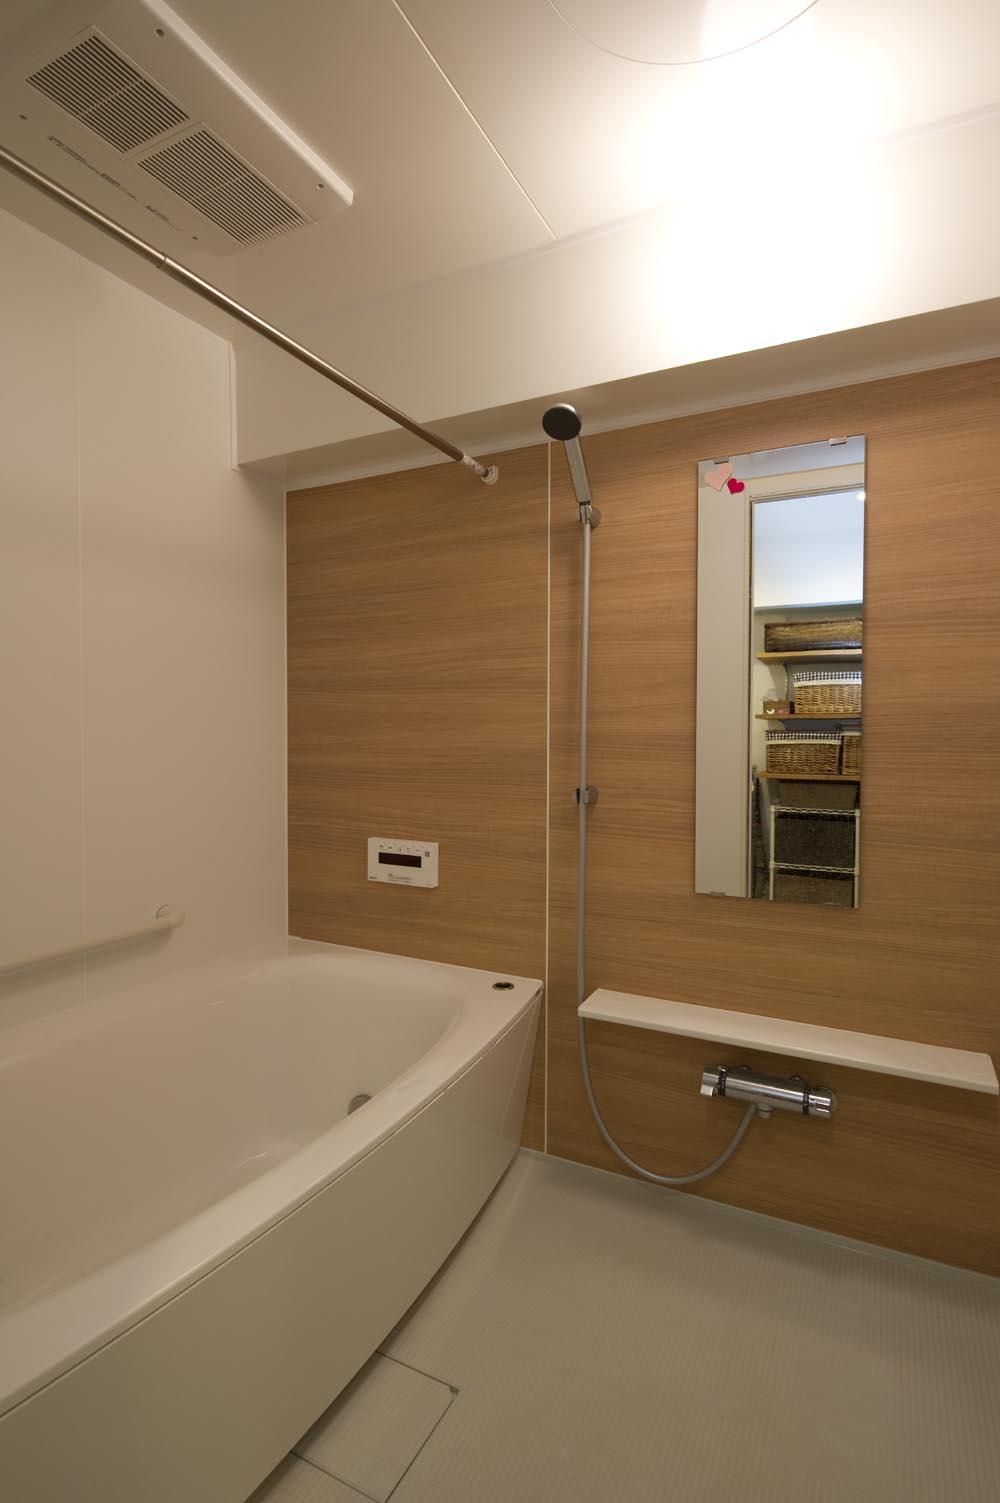 I邸・斜めに配置したキッチンで、動きと変化をの部屋 広々とした浴室